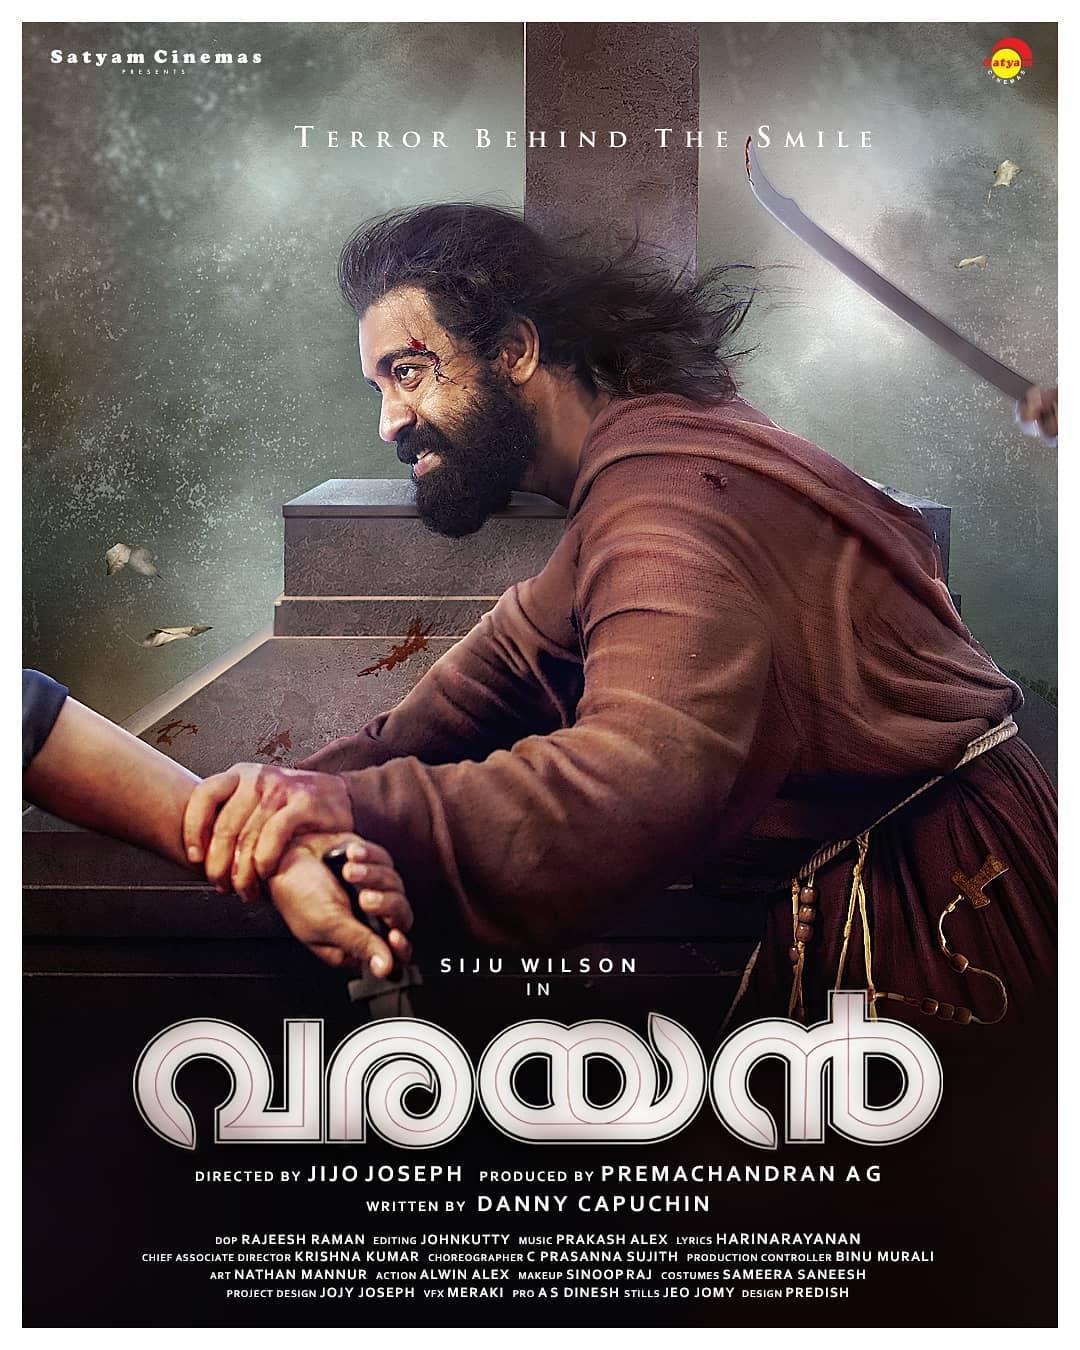 Is Siju Wilson's 'Priest' look inspired from Mammootty? - Malayalam News -  IndiaGlitz.com